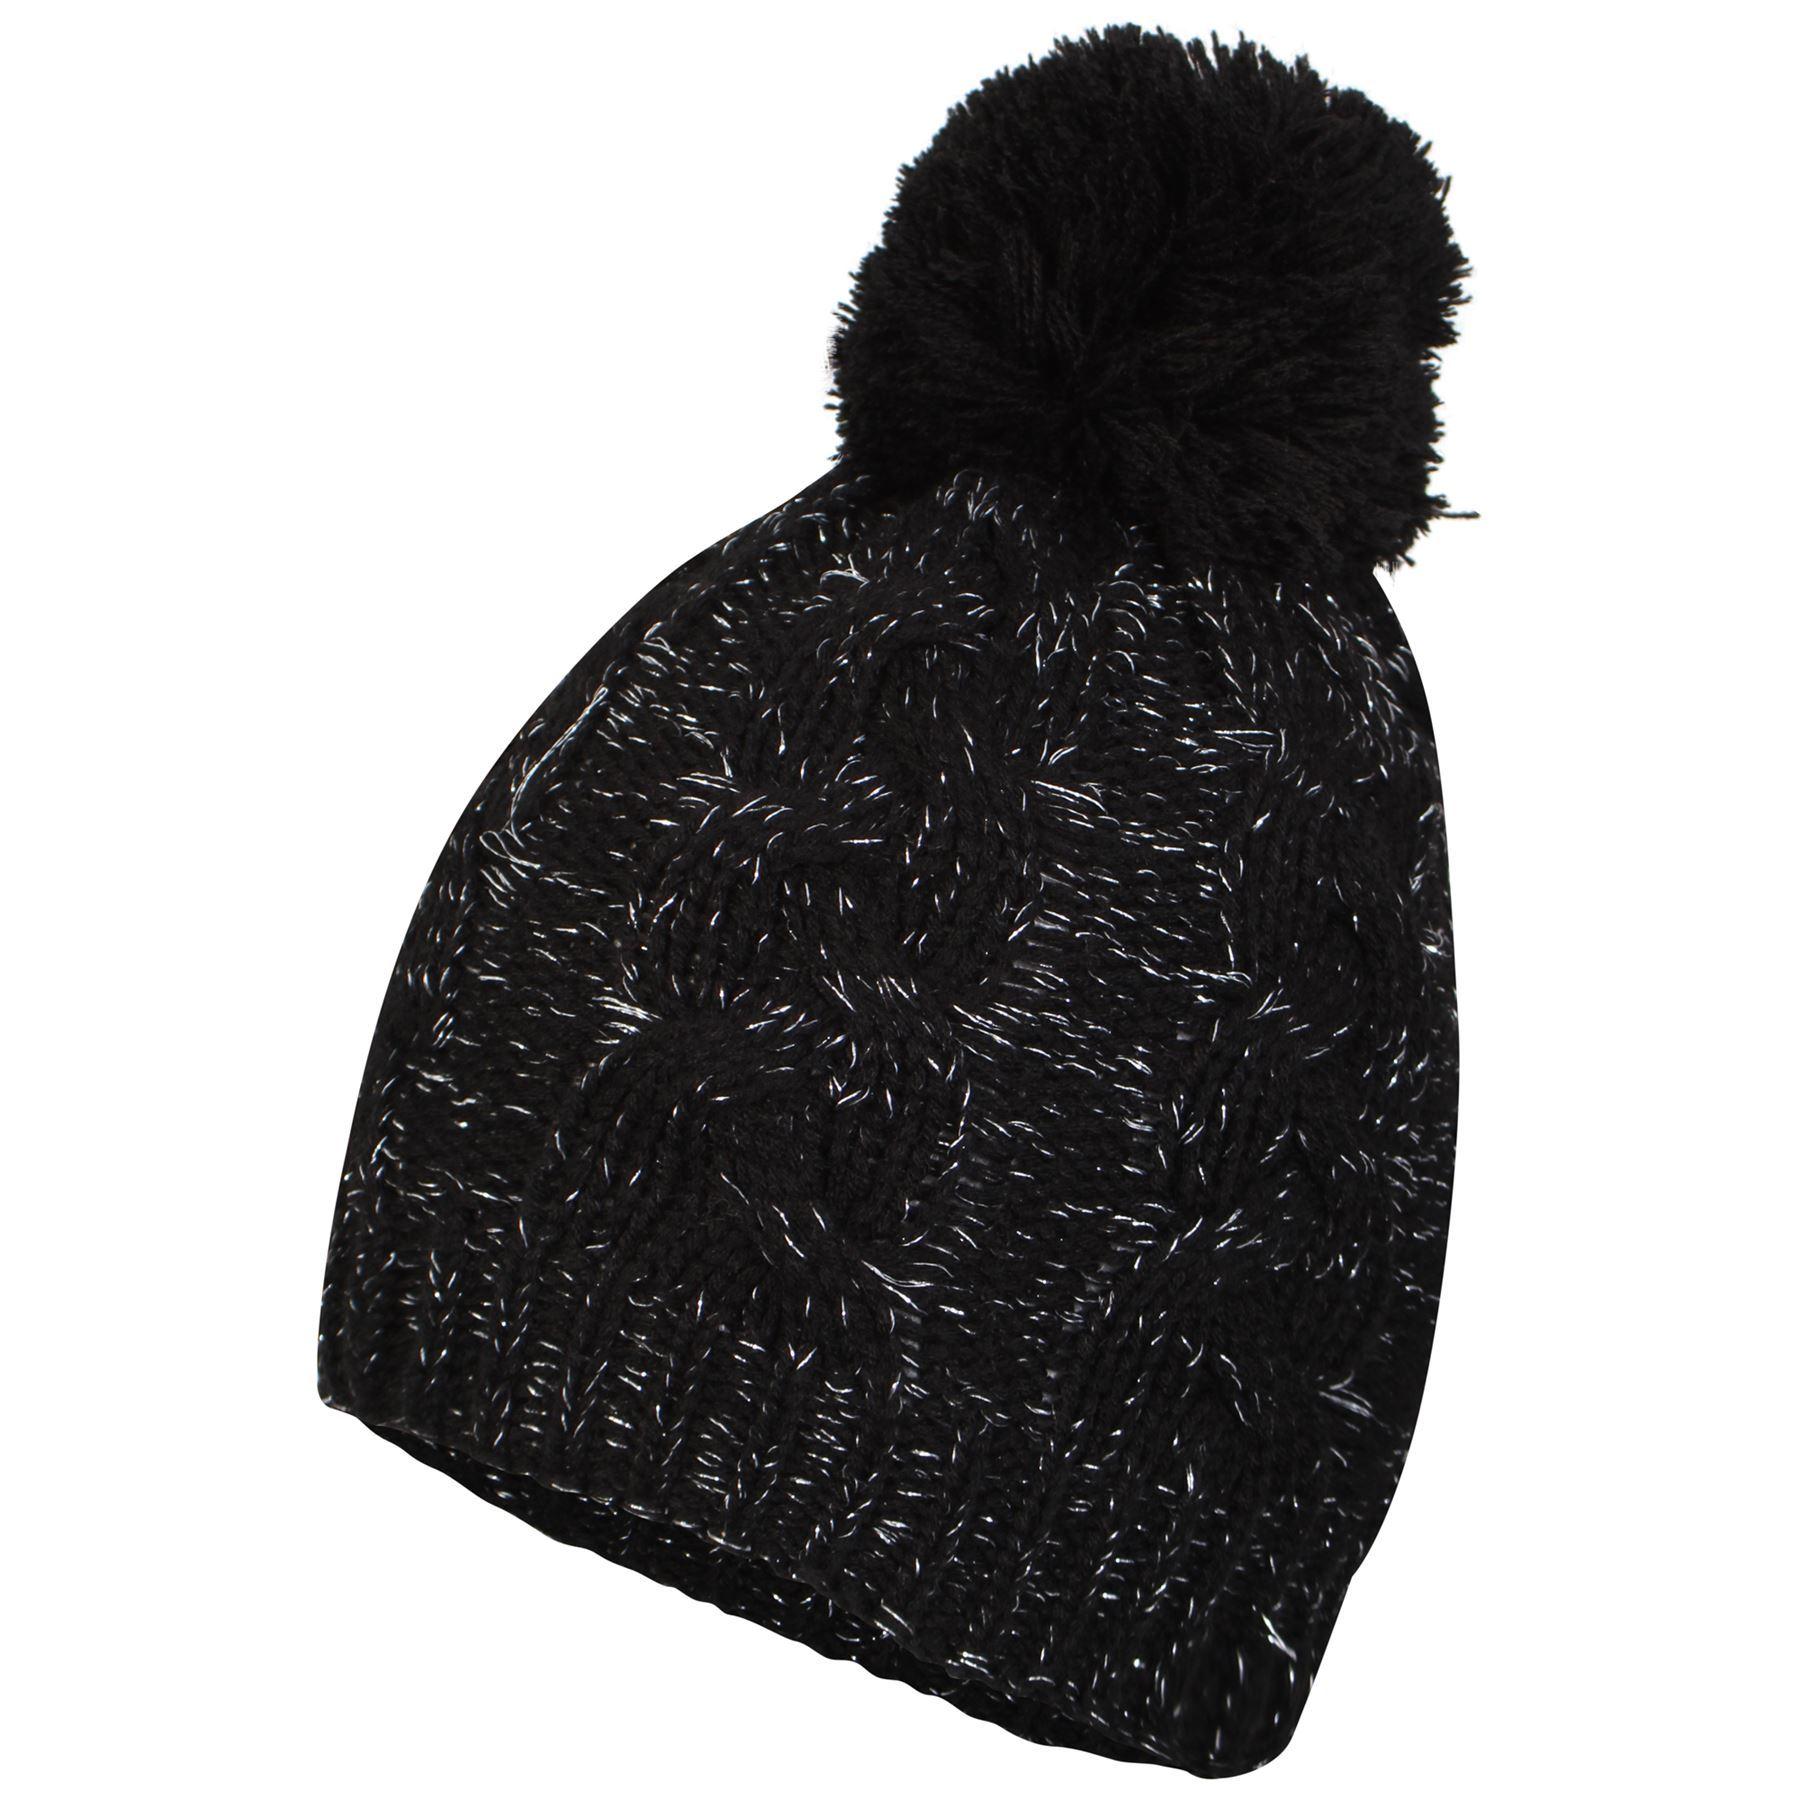 186a347ed91 ... buy women 039 s waterproof thinsulate beanie hat lurex 439d3 e2563 ...